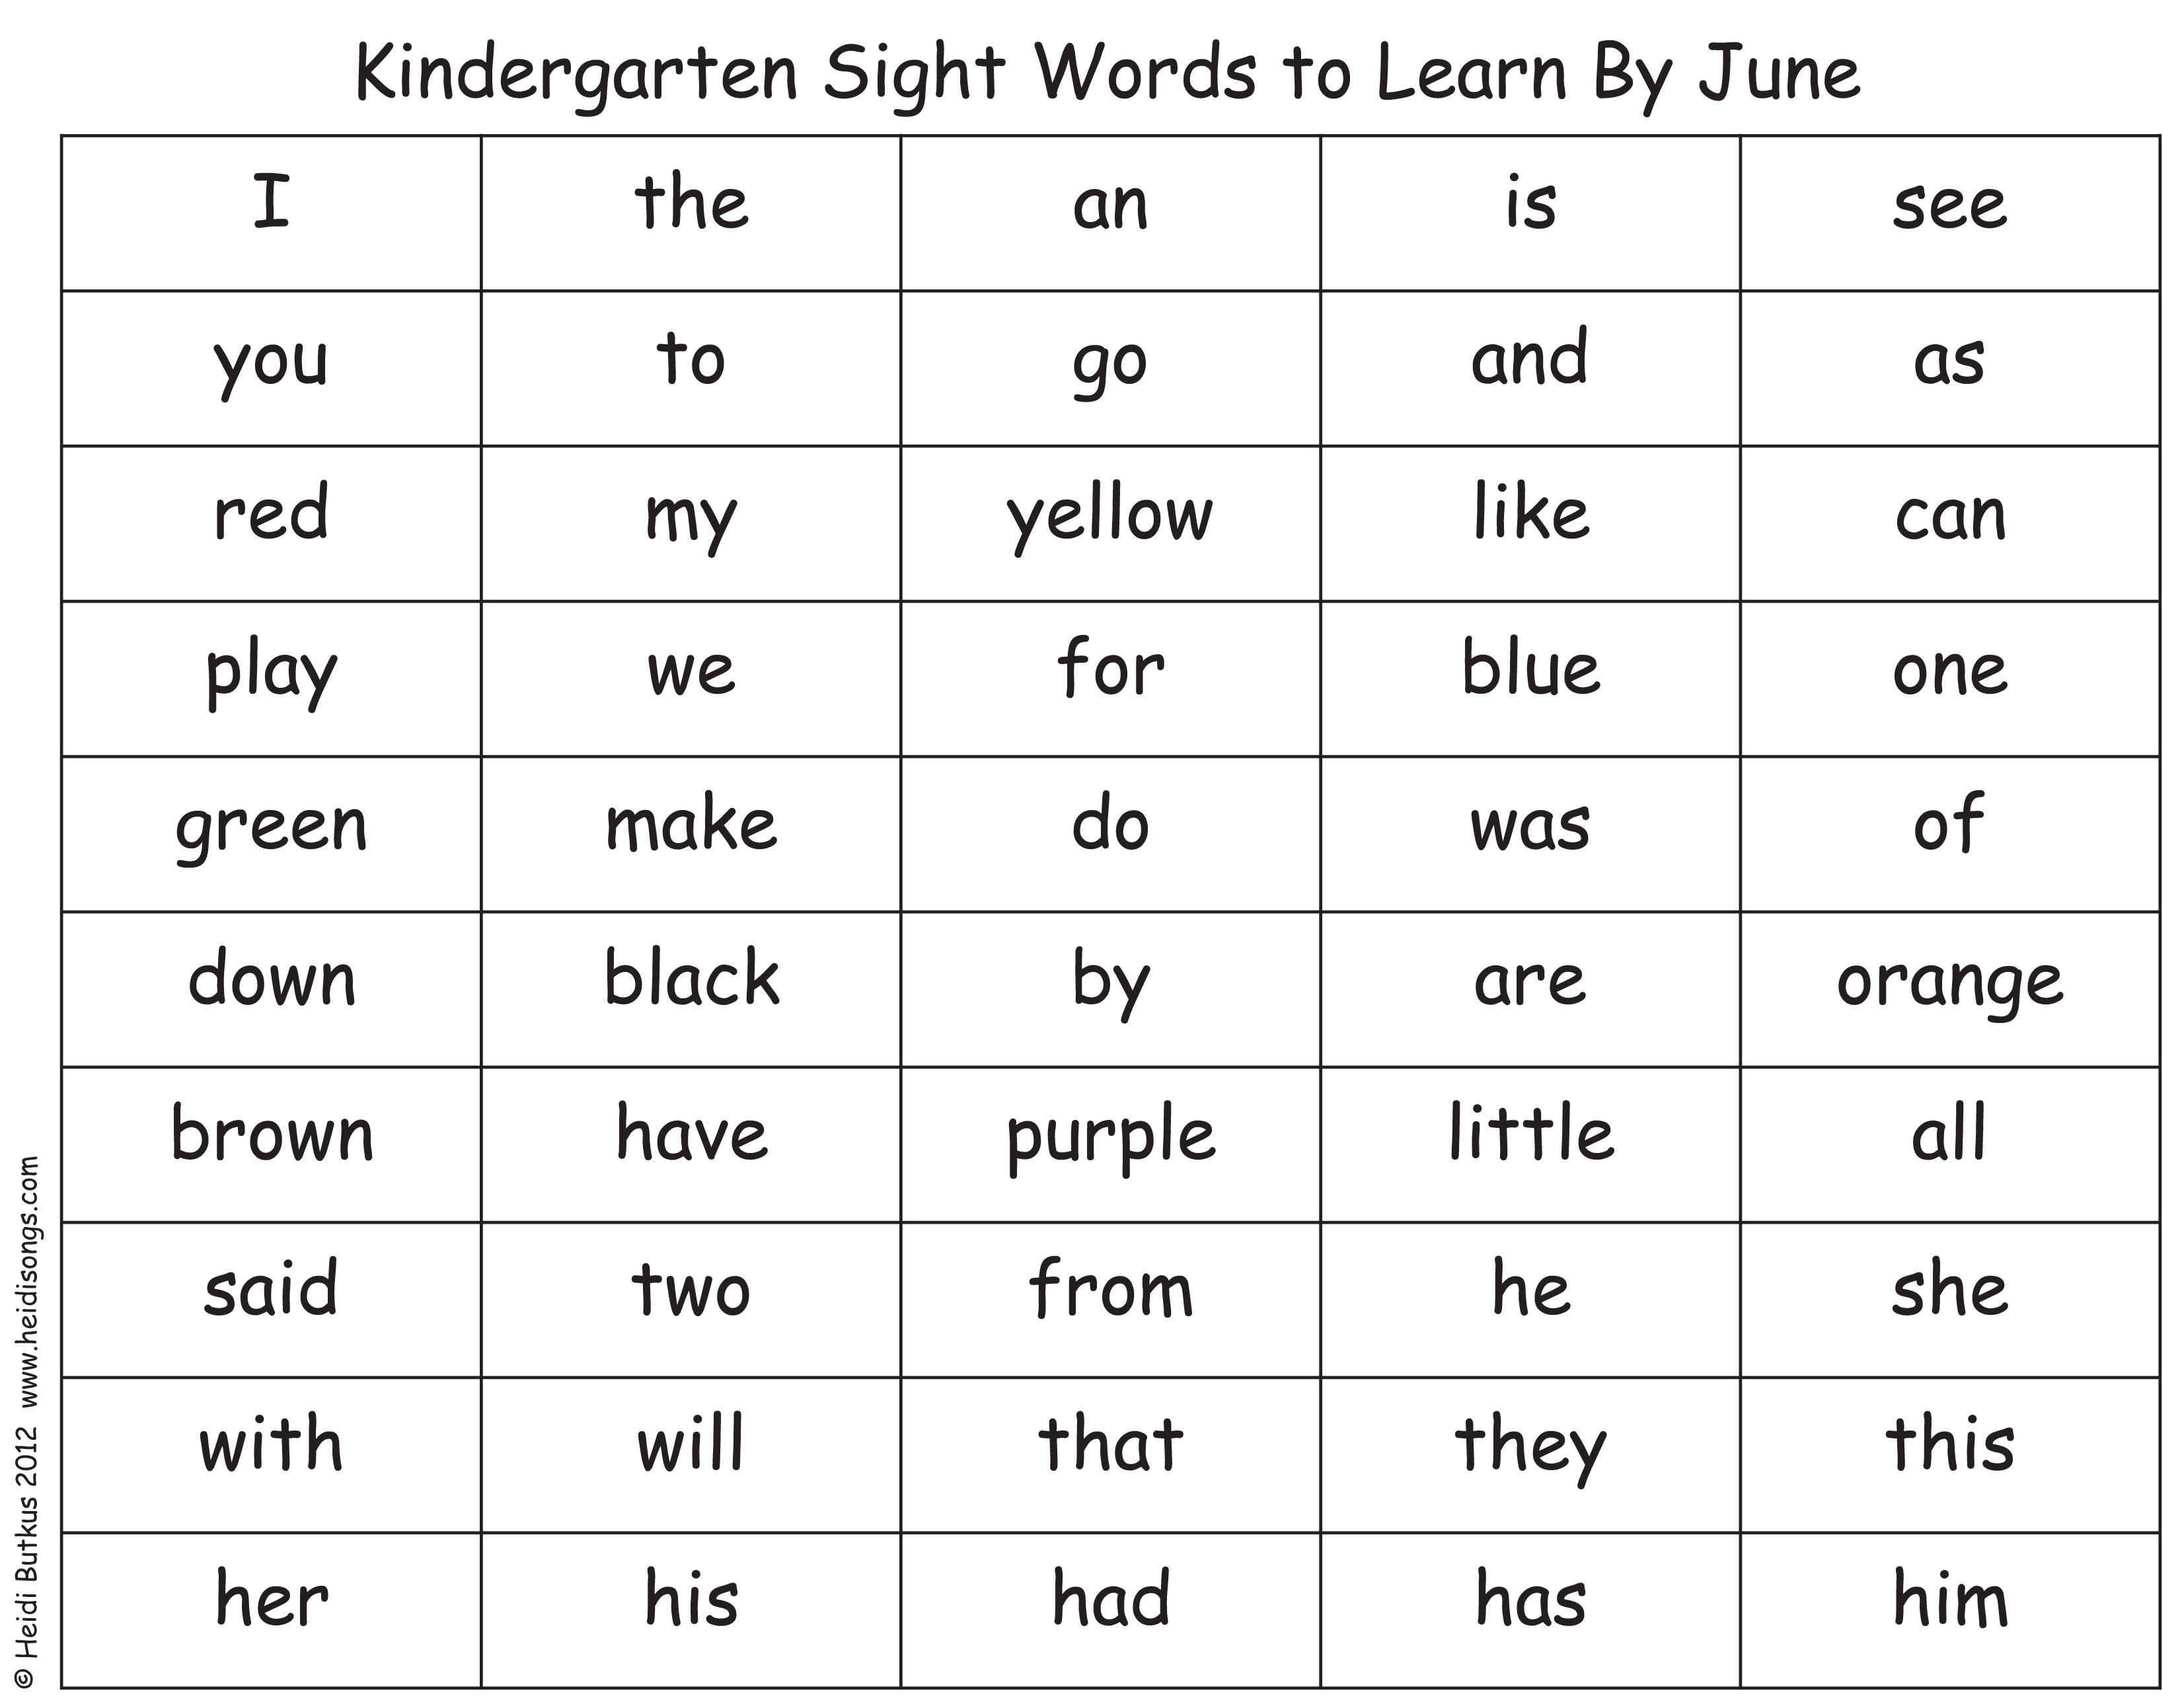 Kindergarten Sight Words List | Language Arts Ideas ...